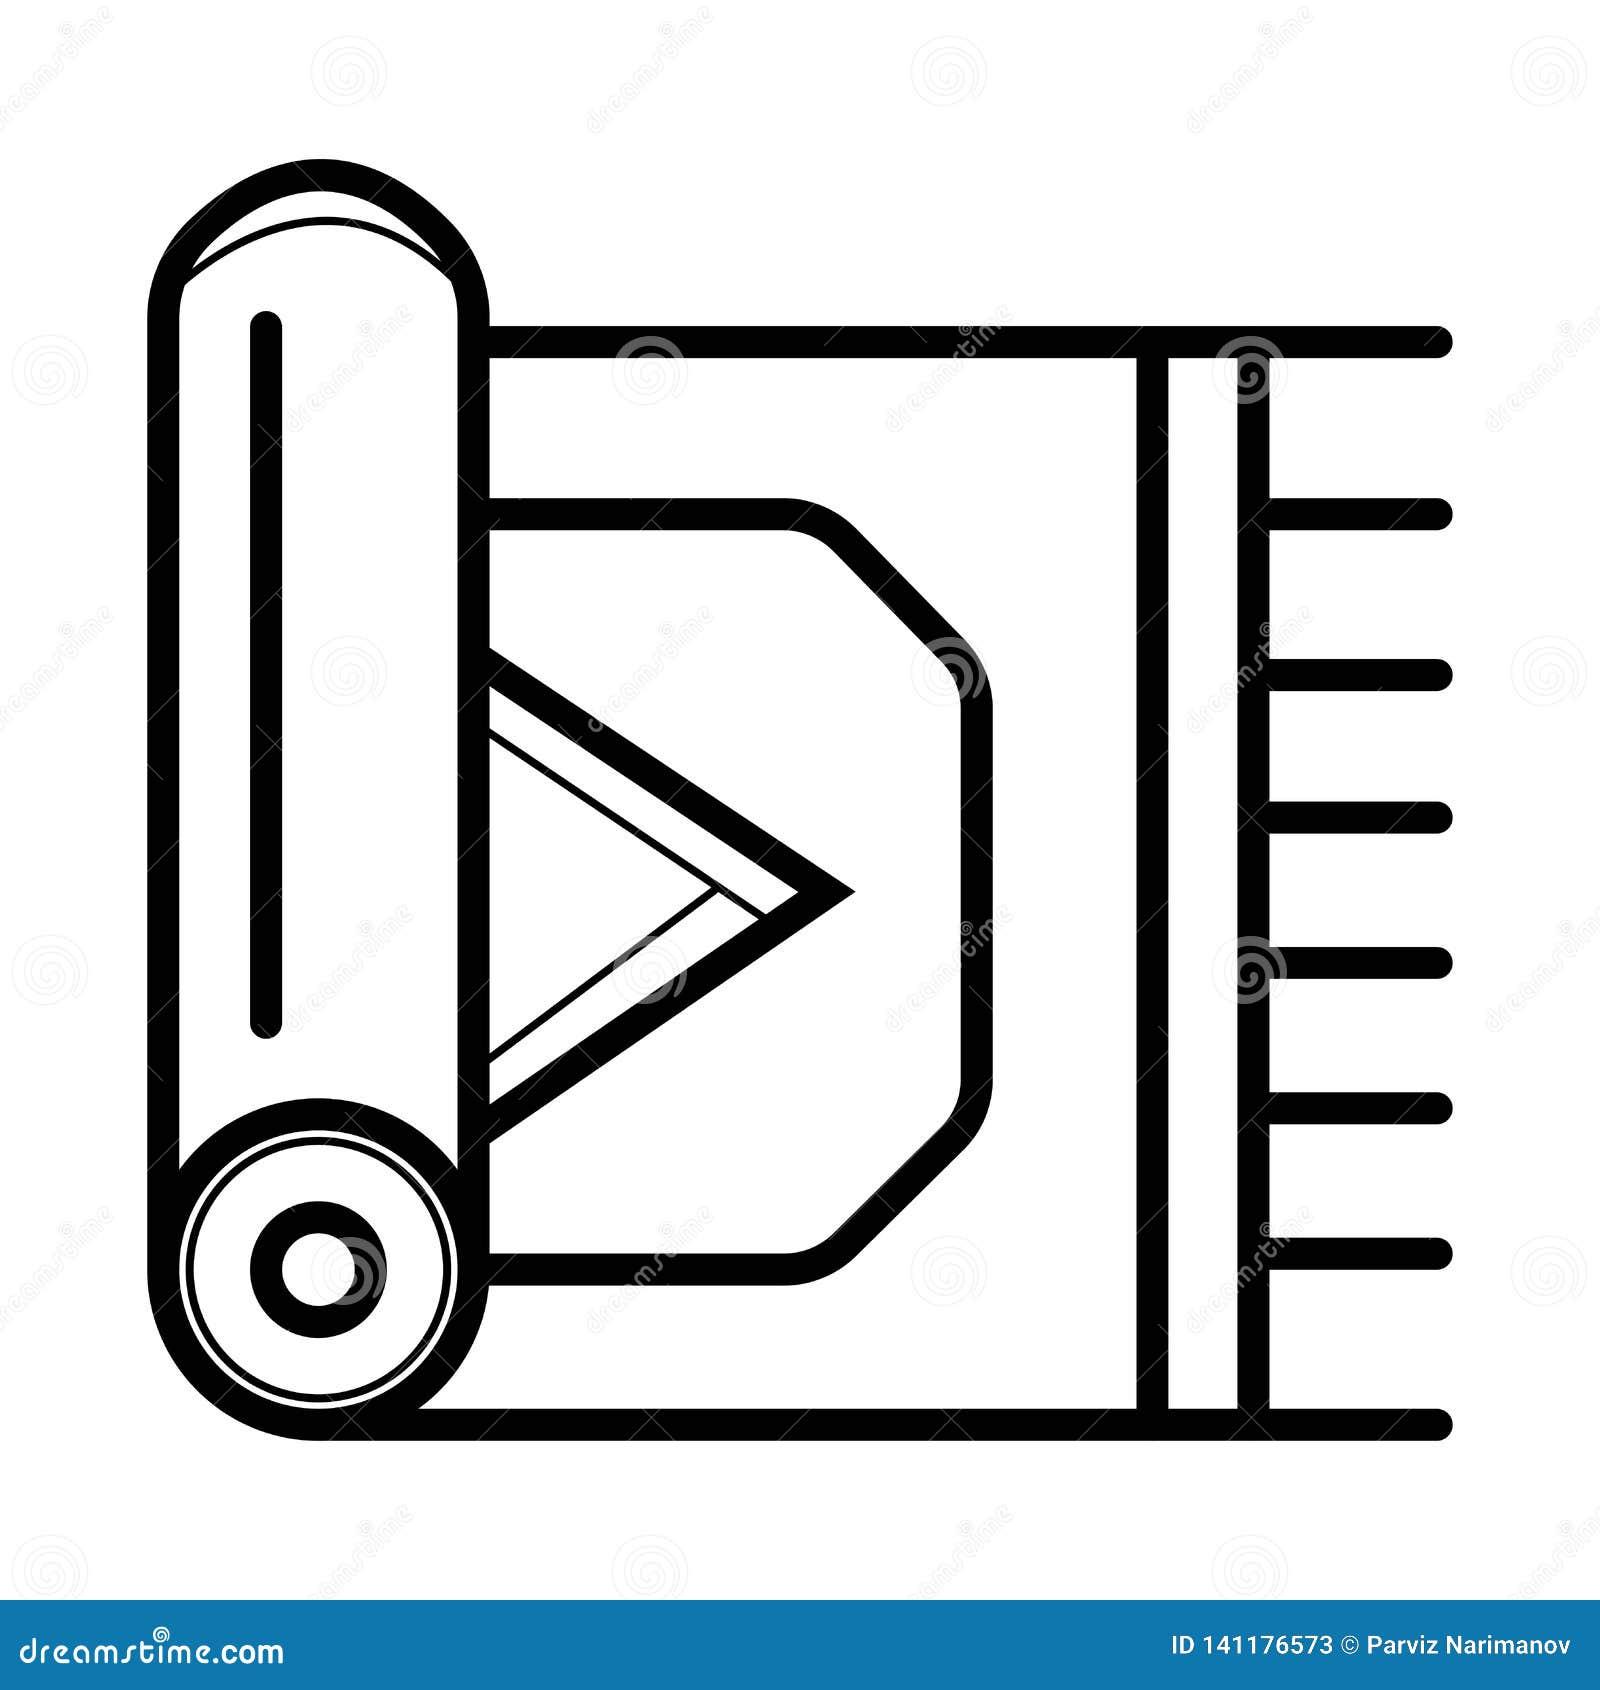 Carpet icon. vector